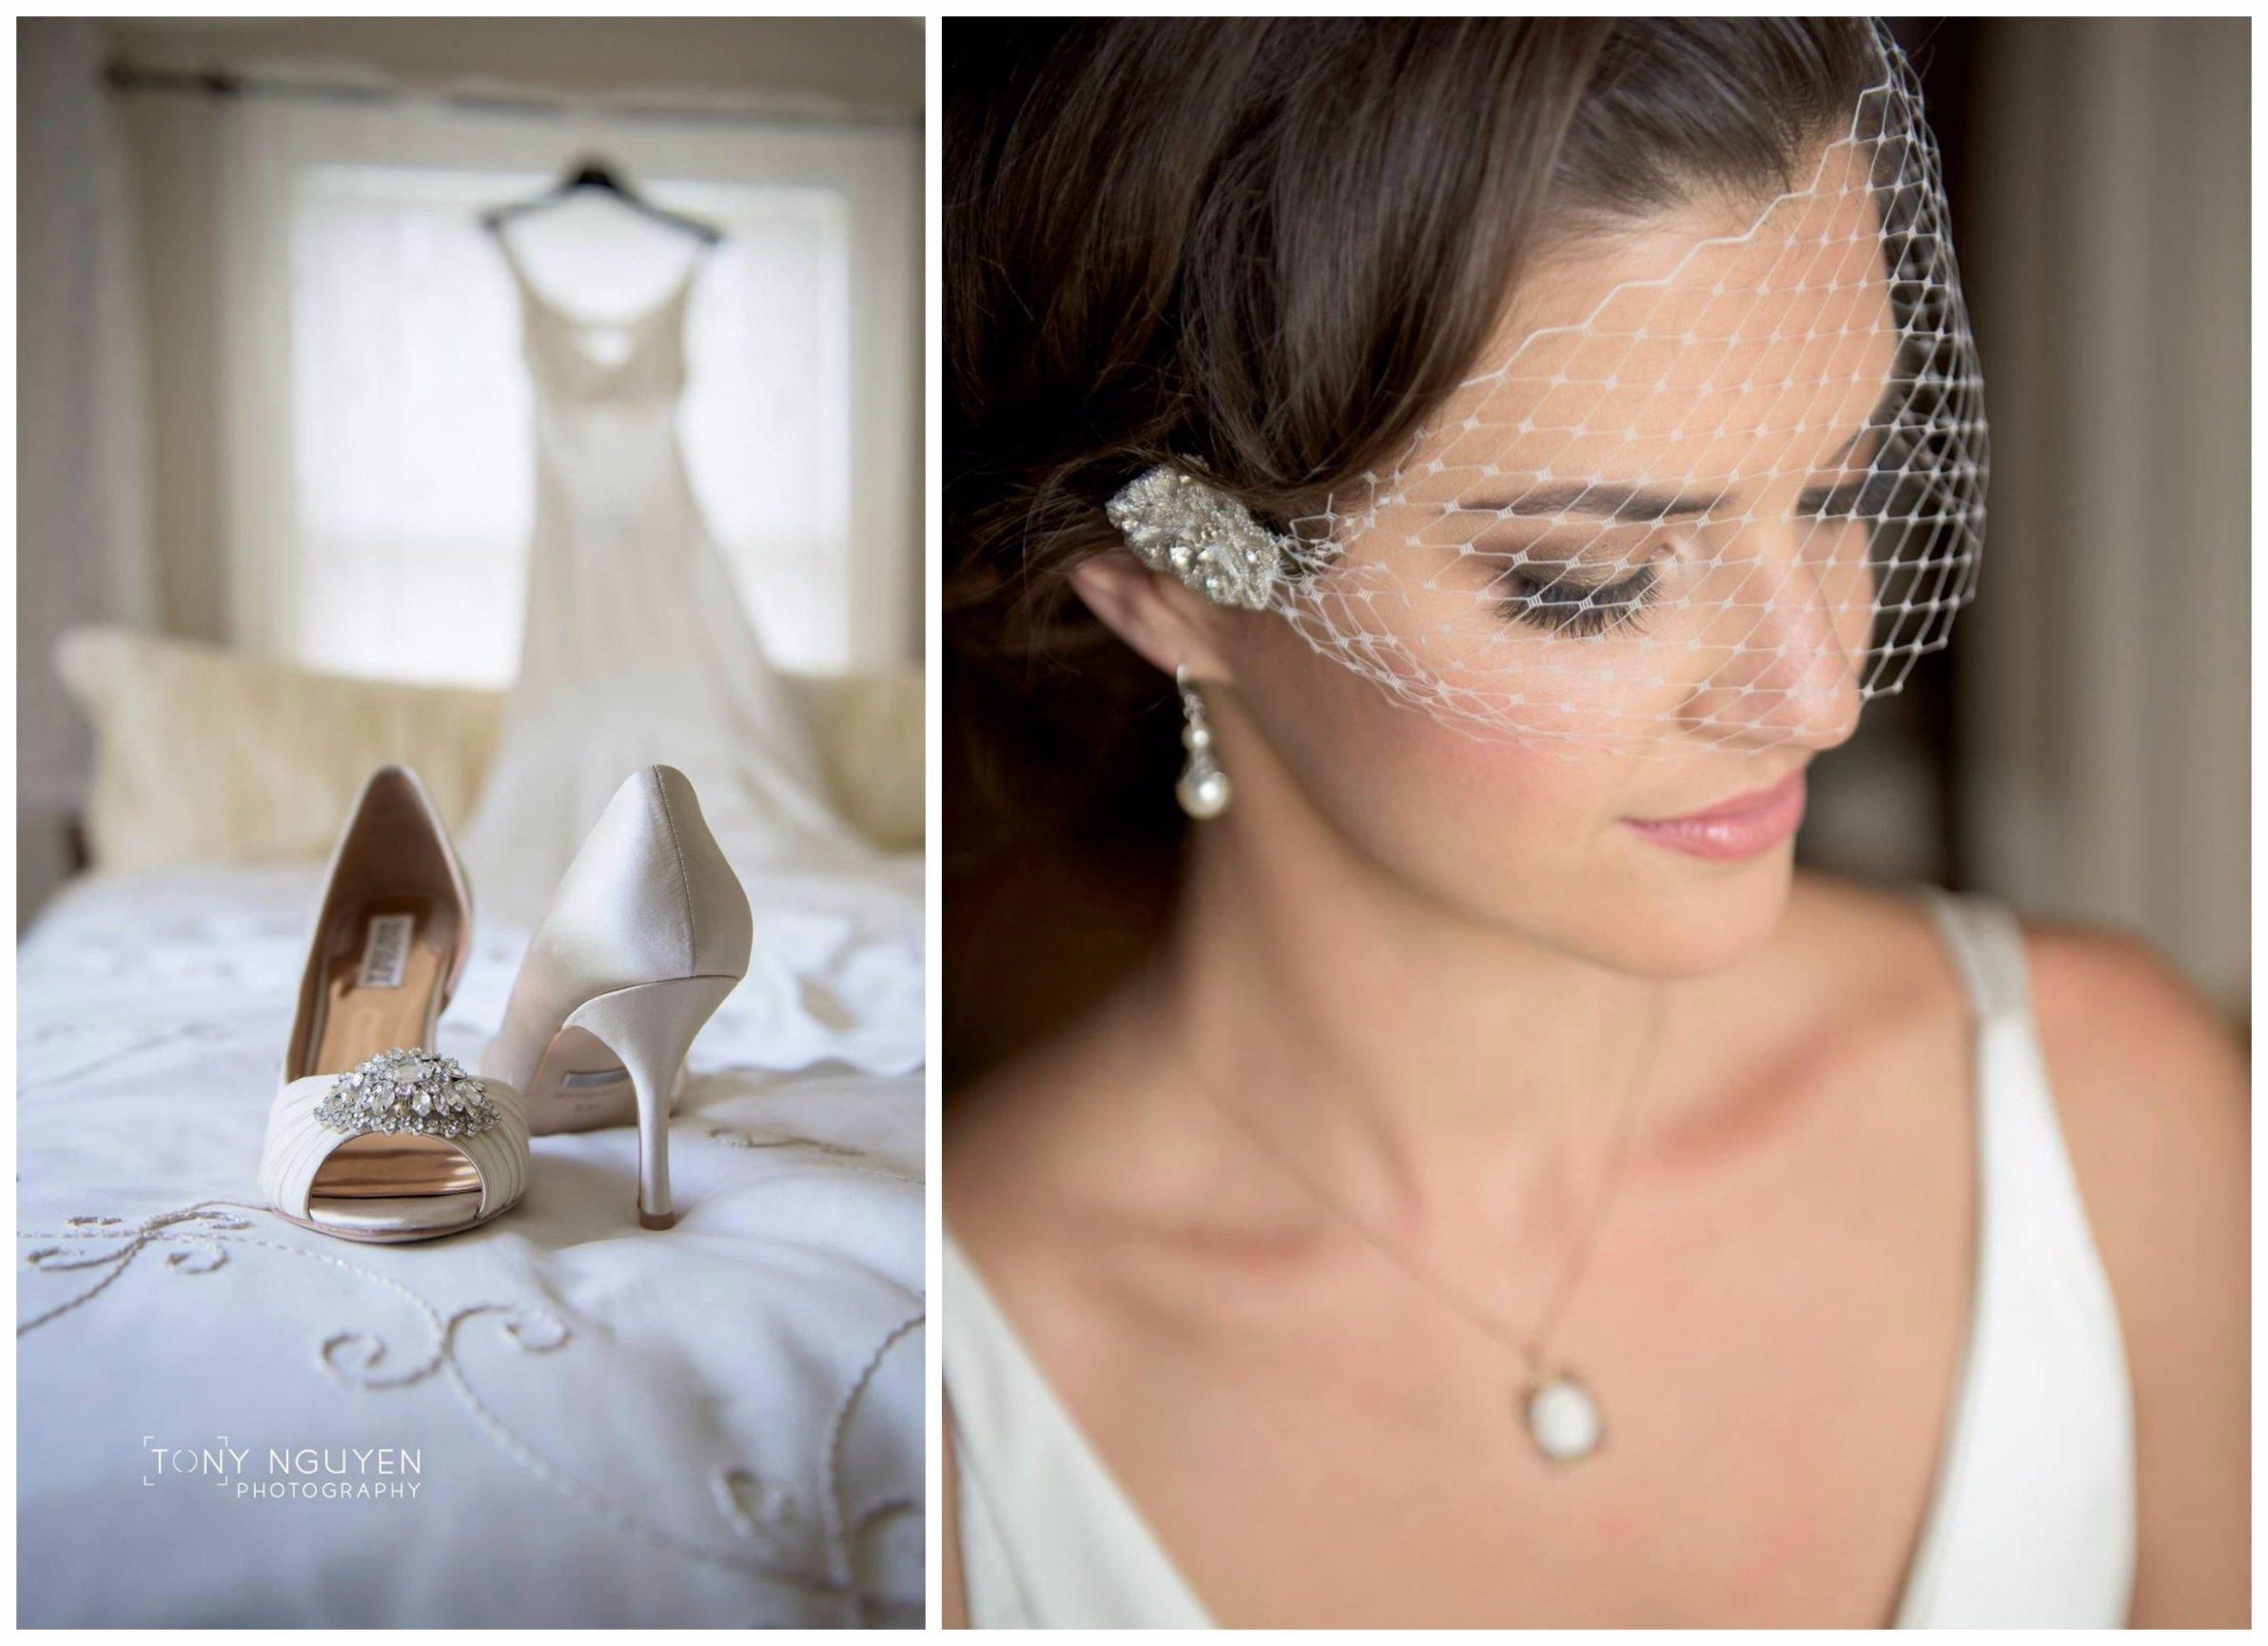 christi reynolds-bridal hair and makeup portfolio